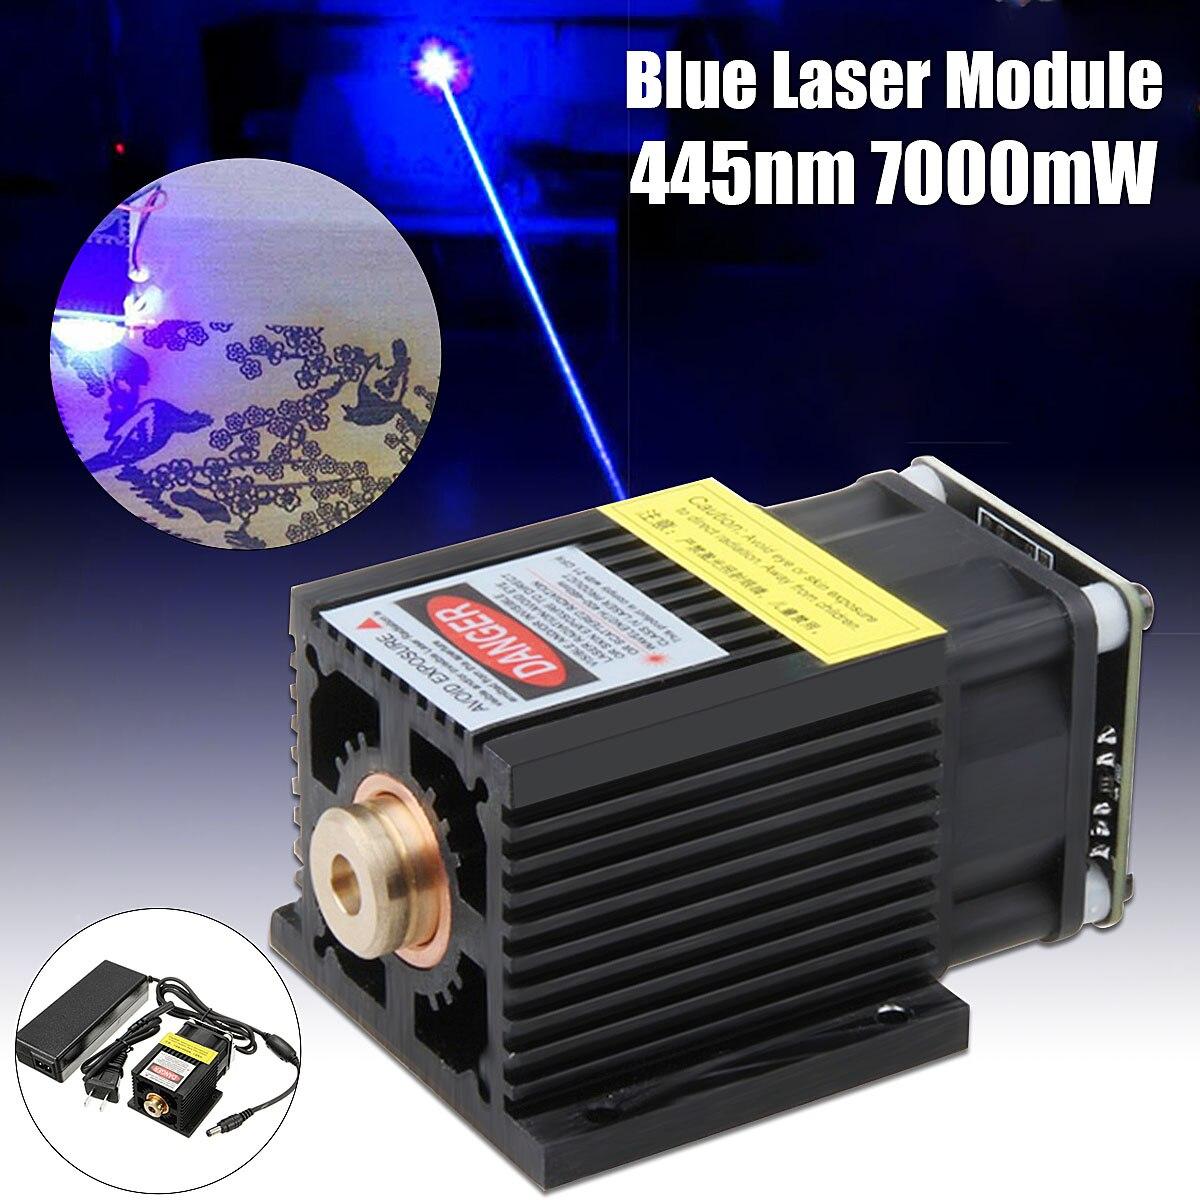 EleksMaker 445nm 7W DC 12V 7000mW Blue Laser Module TTL/PWM With Heatsink For DIY Laser Engraver Machine цена 2017